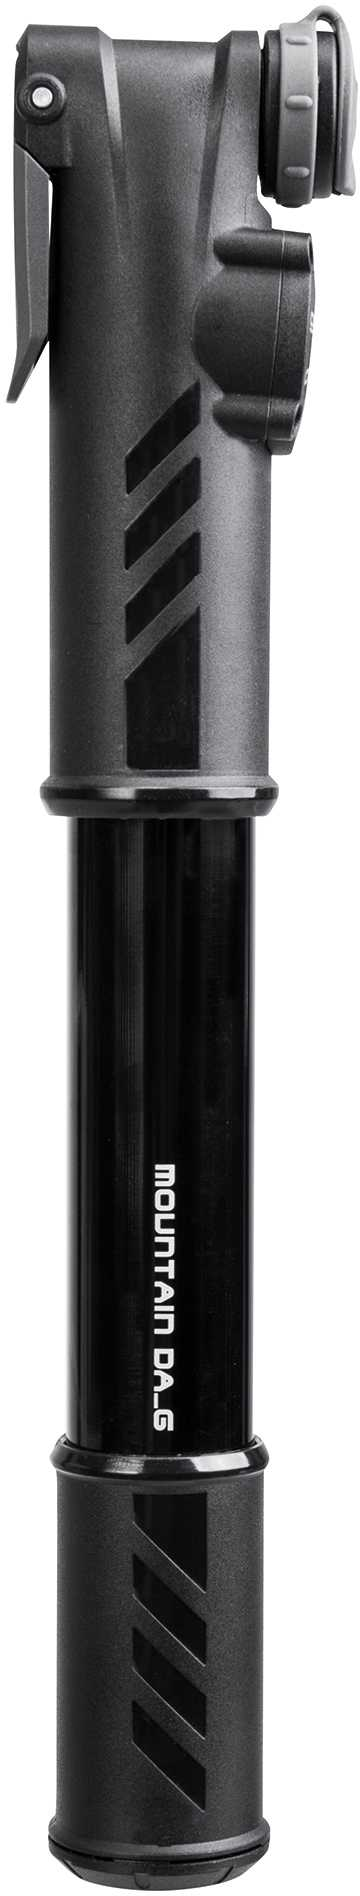 Minipump Topeak Mountain DA G svart | Minipumper